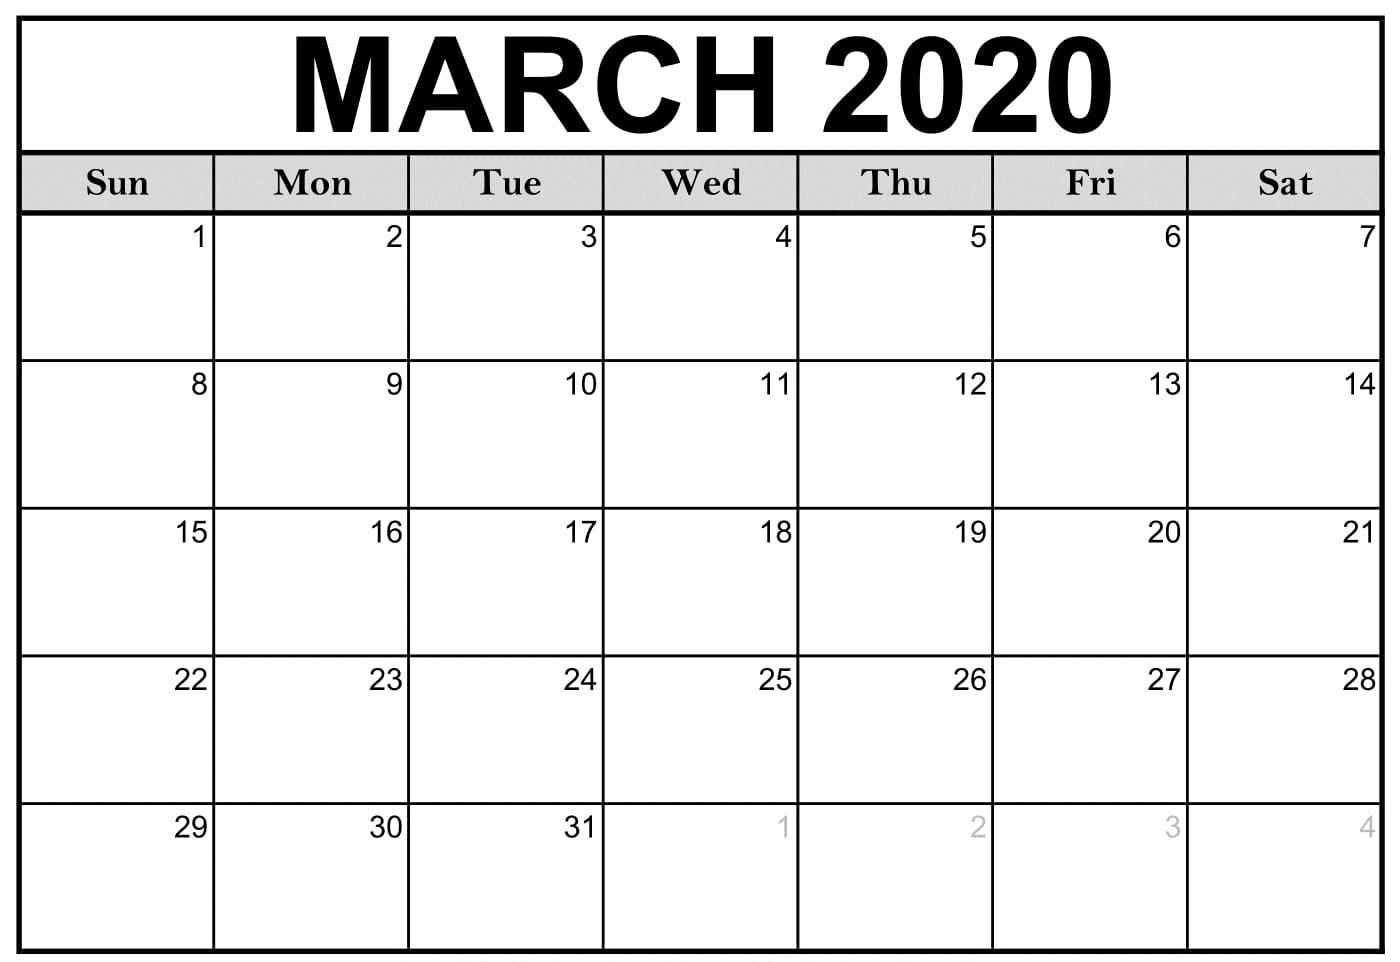 March 2020 Calendar Wallpaper Download